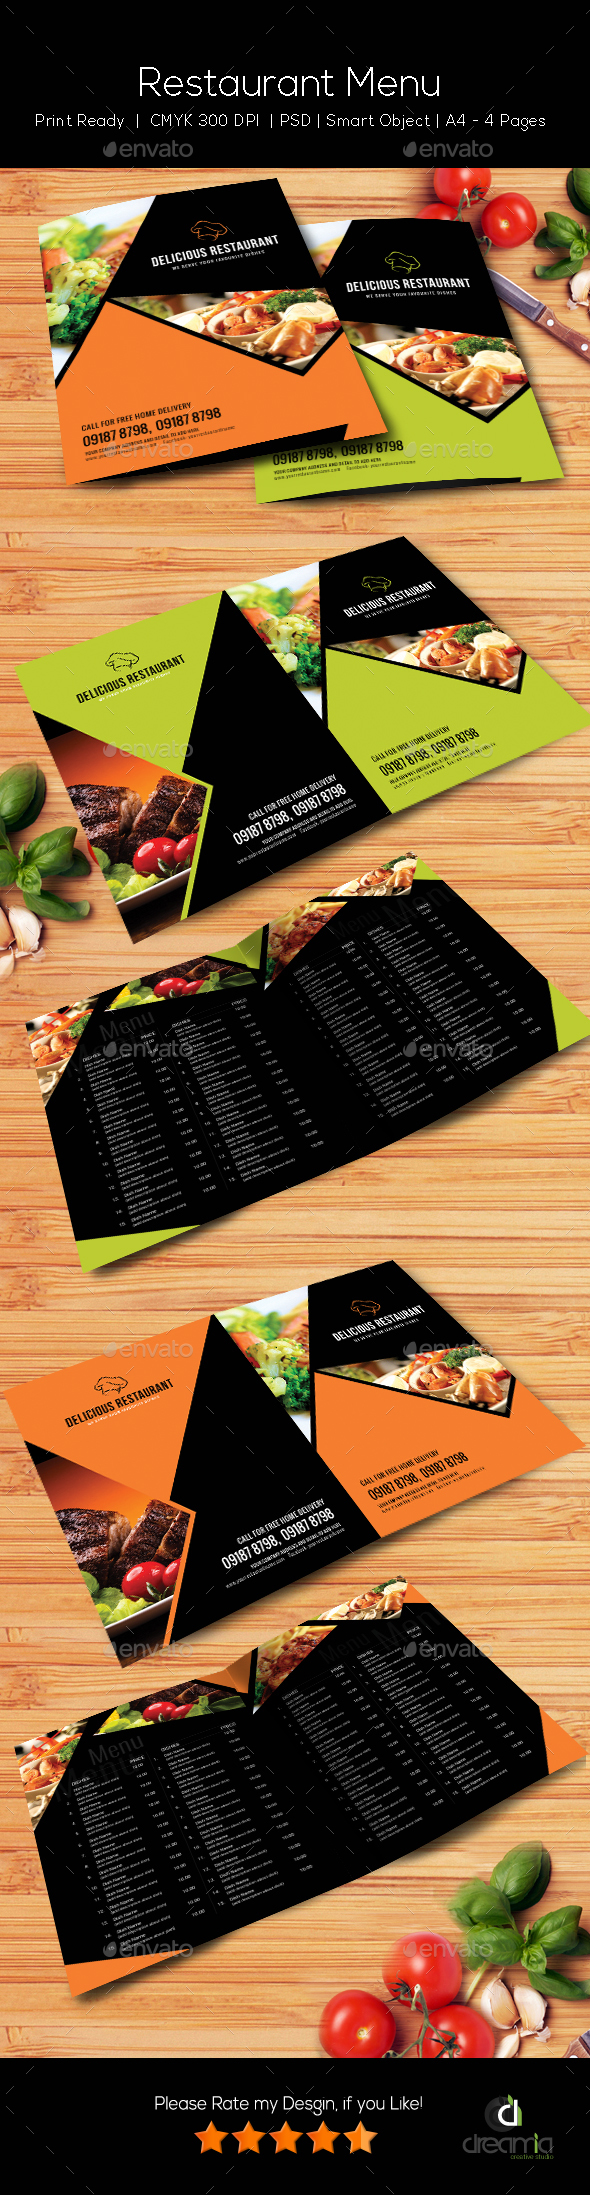 Restaurant Menu Template - Vol4 - Food Menus Print Templates